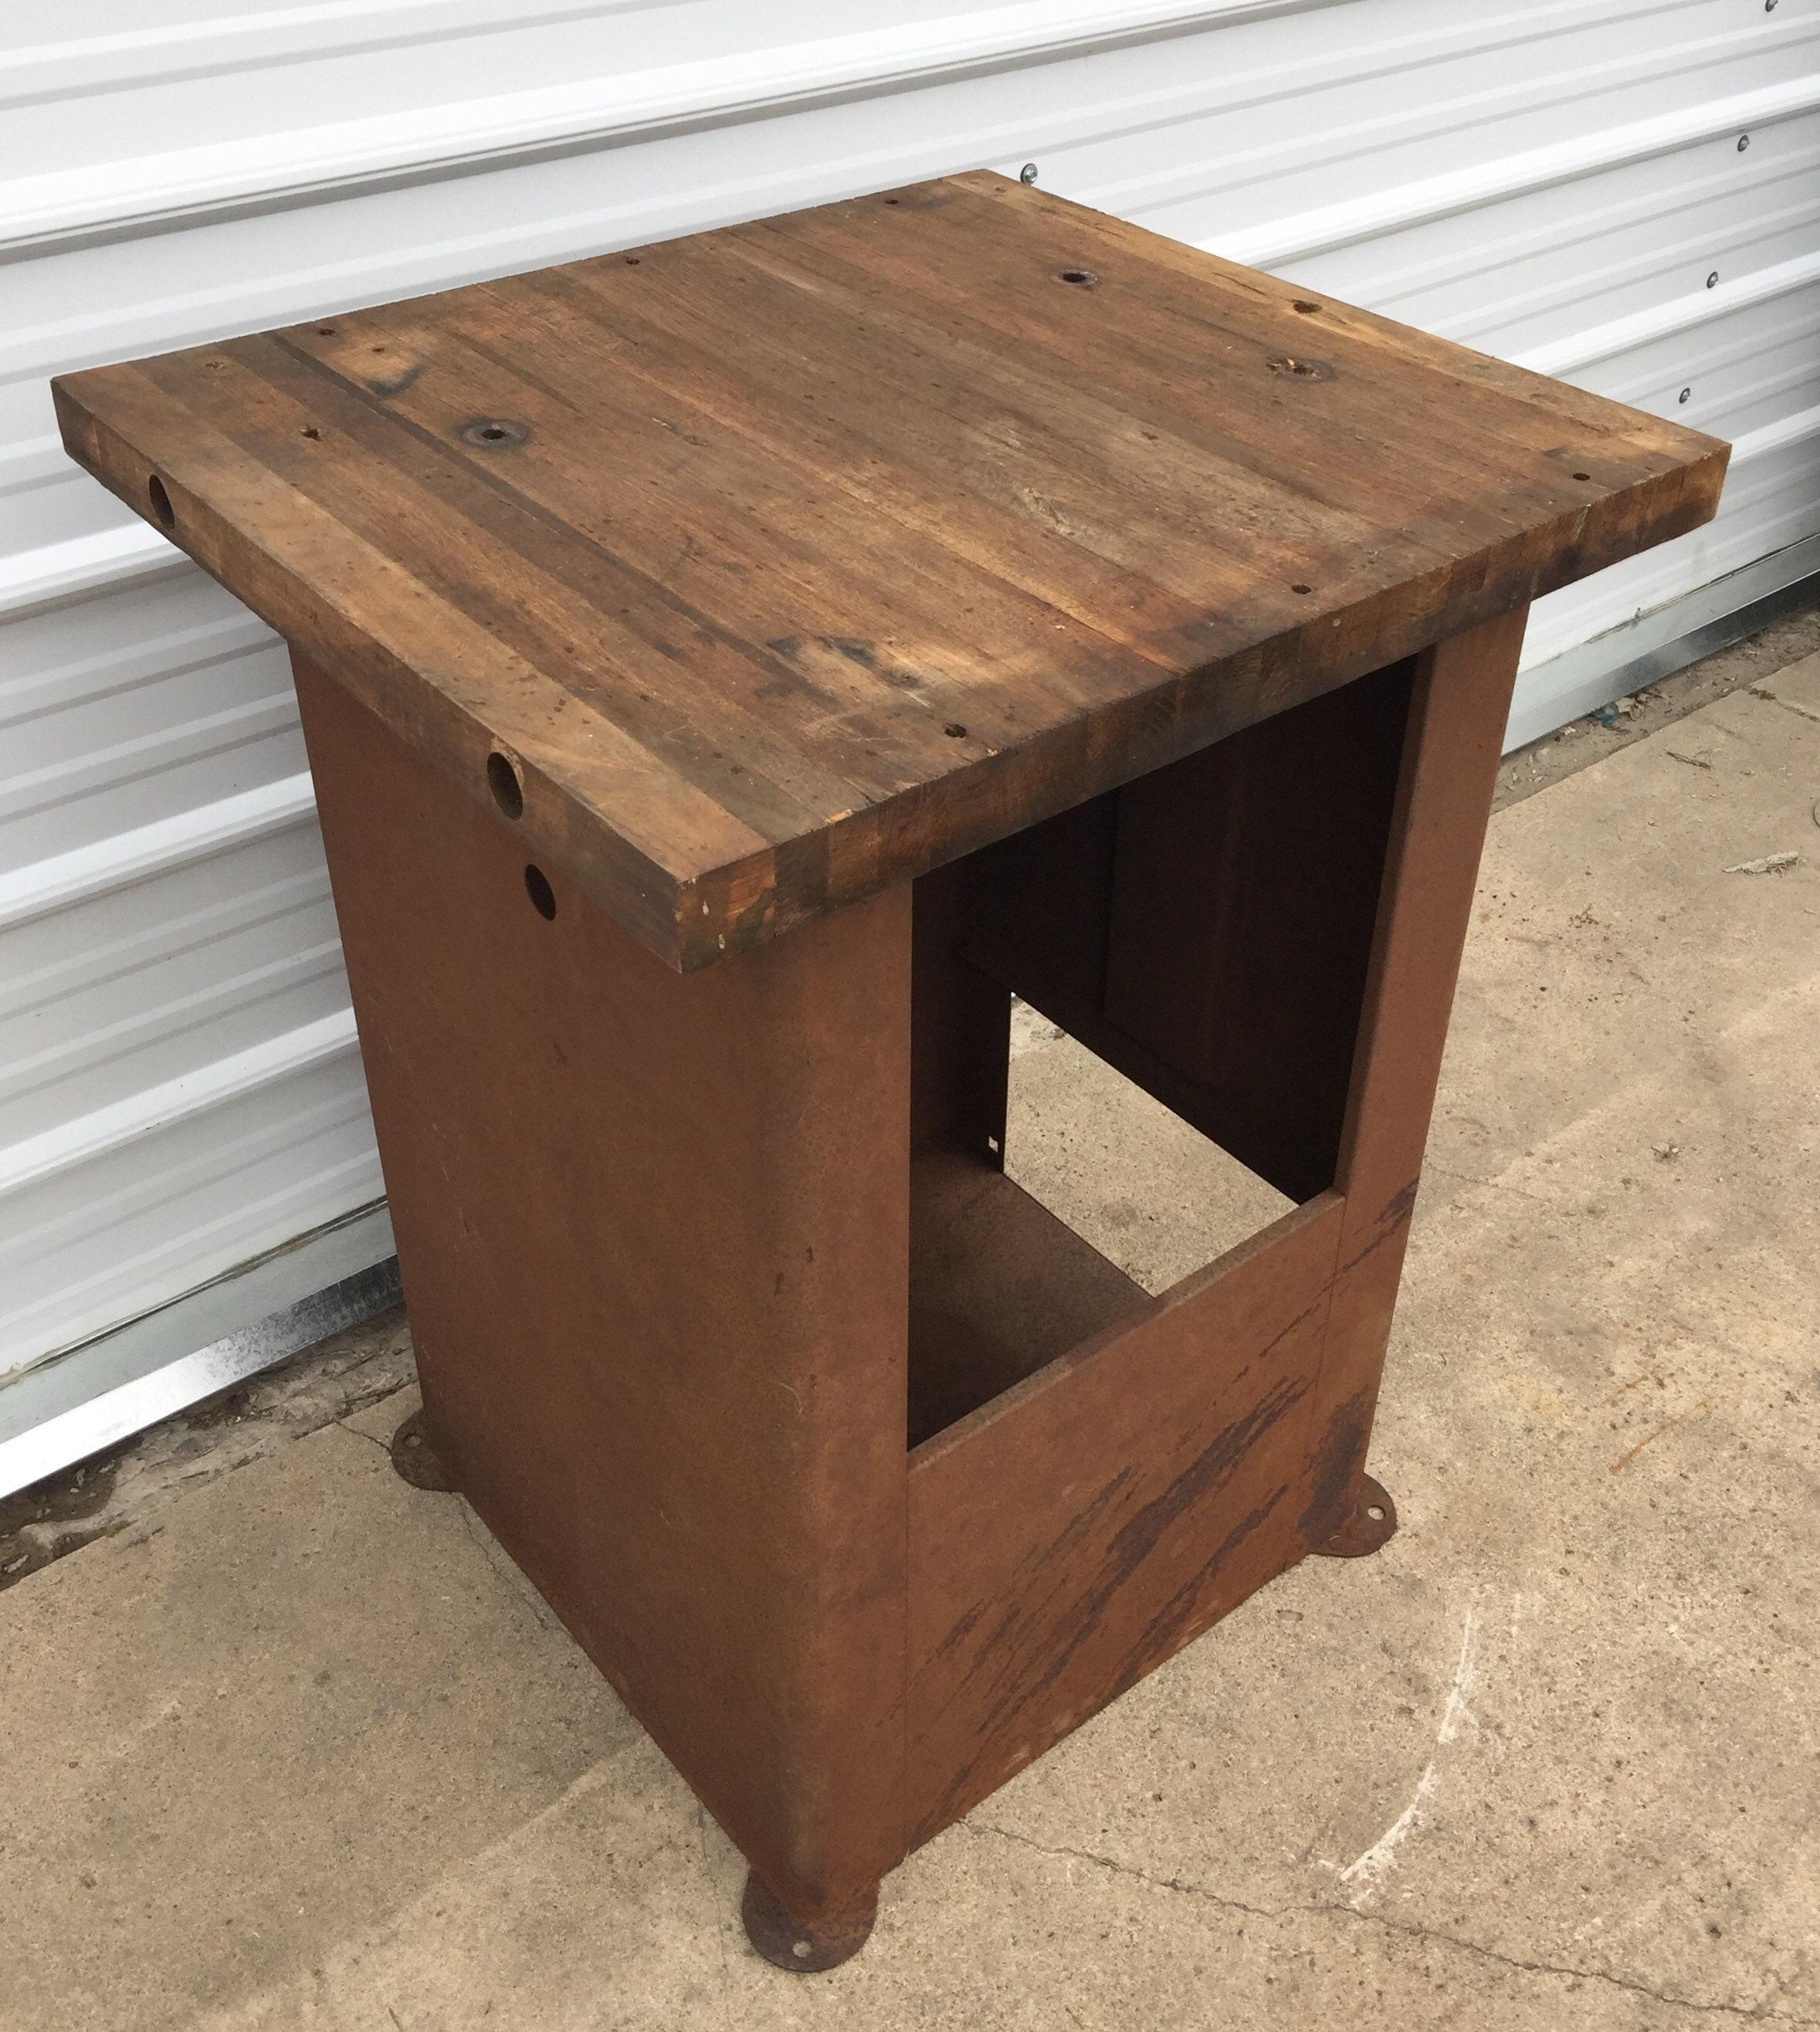 Vintage Industrial Workbench Steel Machine Base Butcher Block Wood Top Table Primitive Kitchen Island Rustic Home Decor